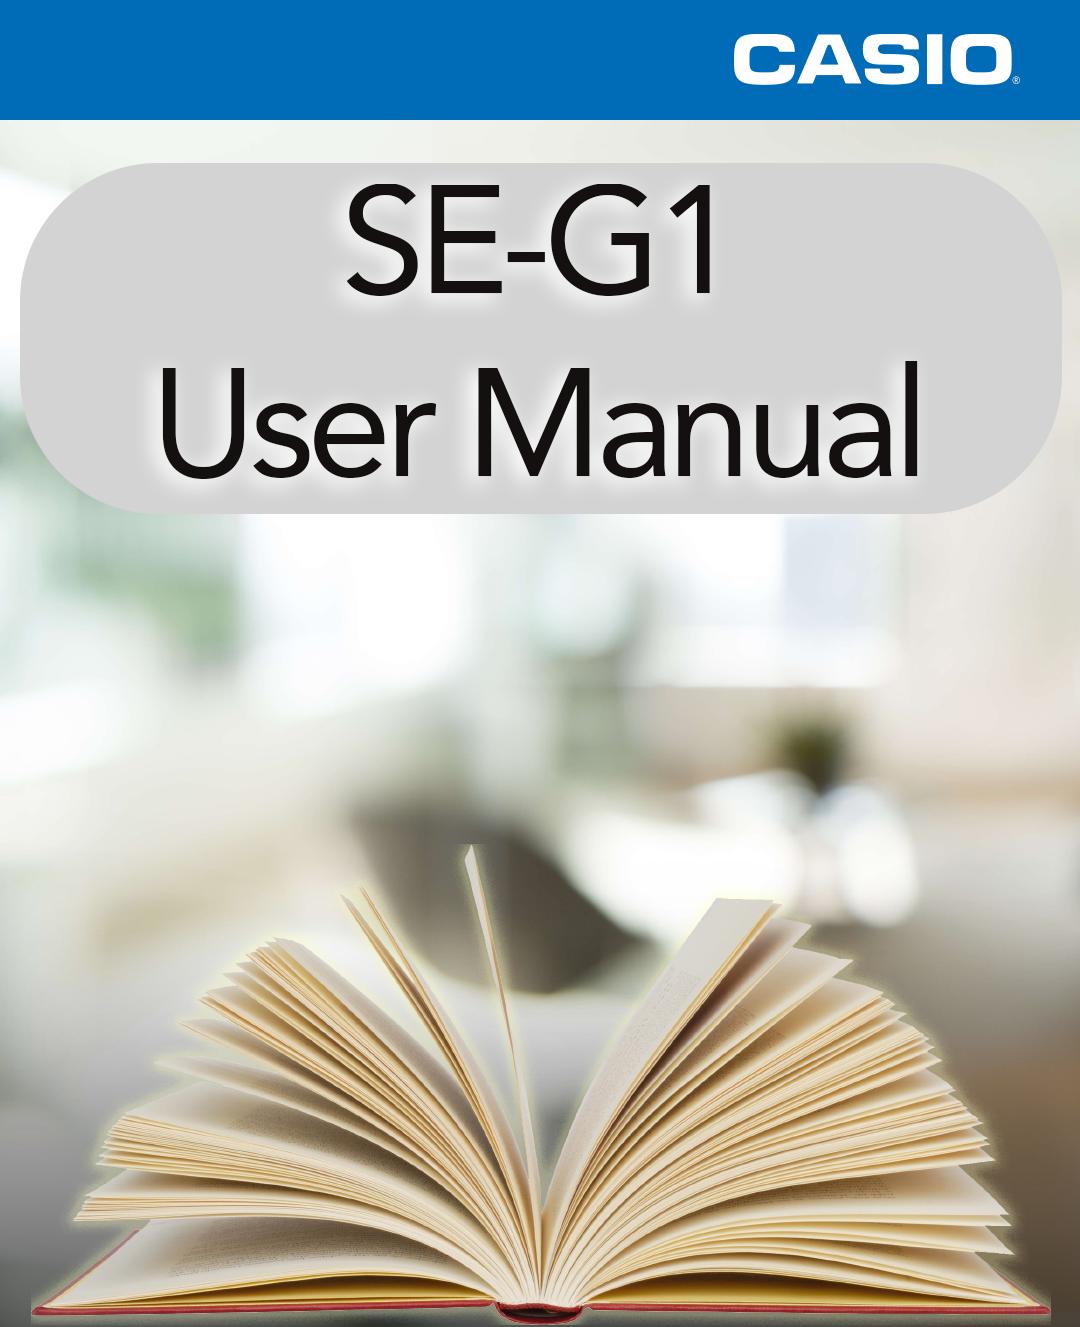 Casio SE-G1 User Manual